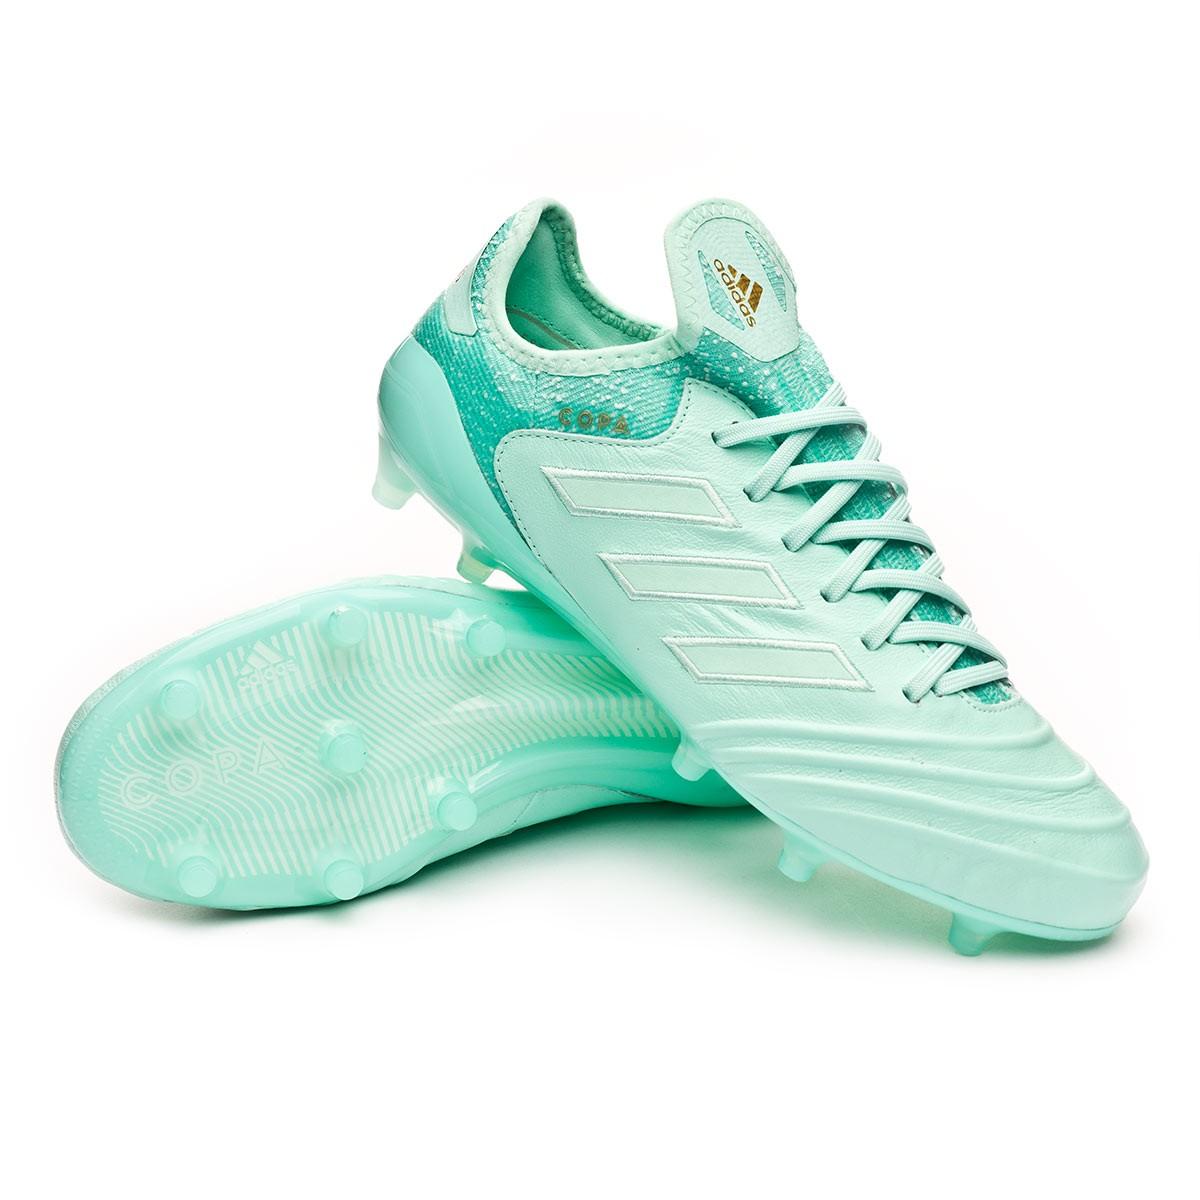 new arrival ac912 3276d adidas Copa 18.1 FG Boot